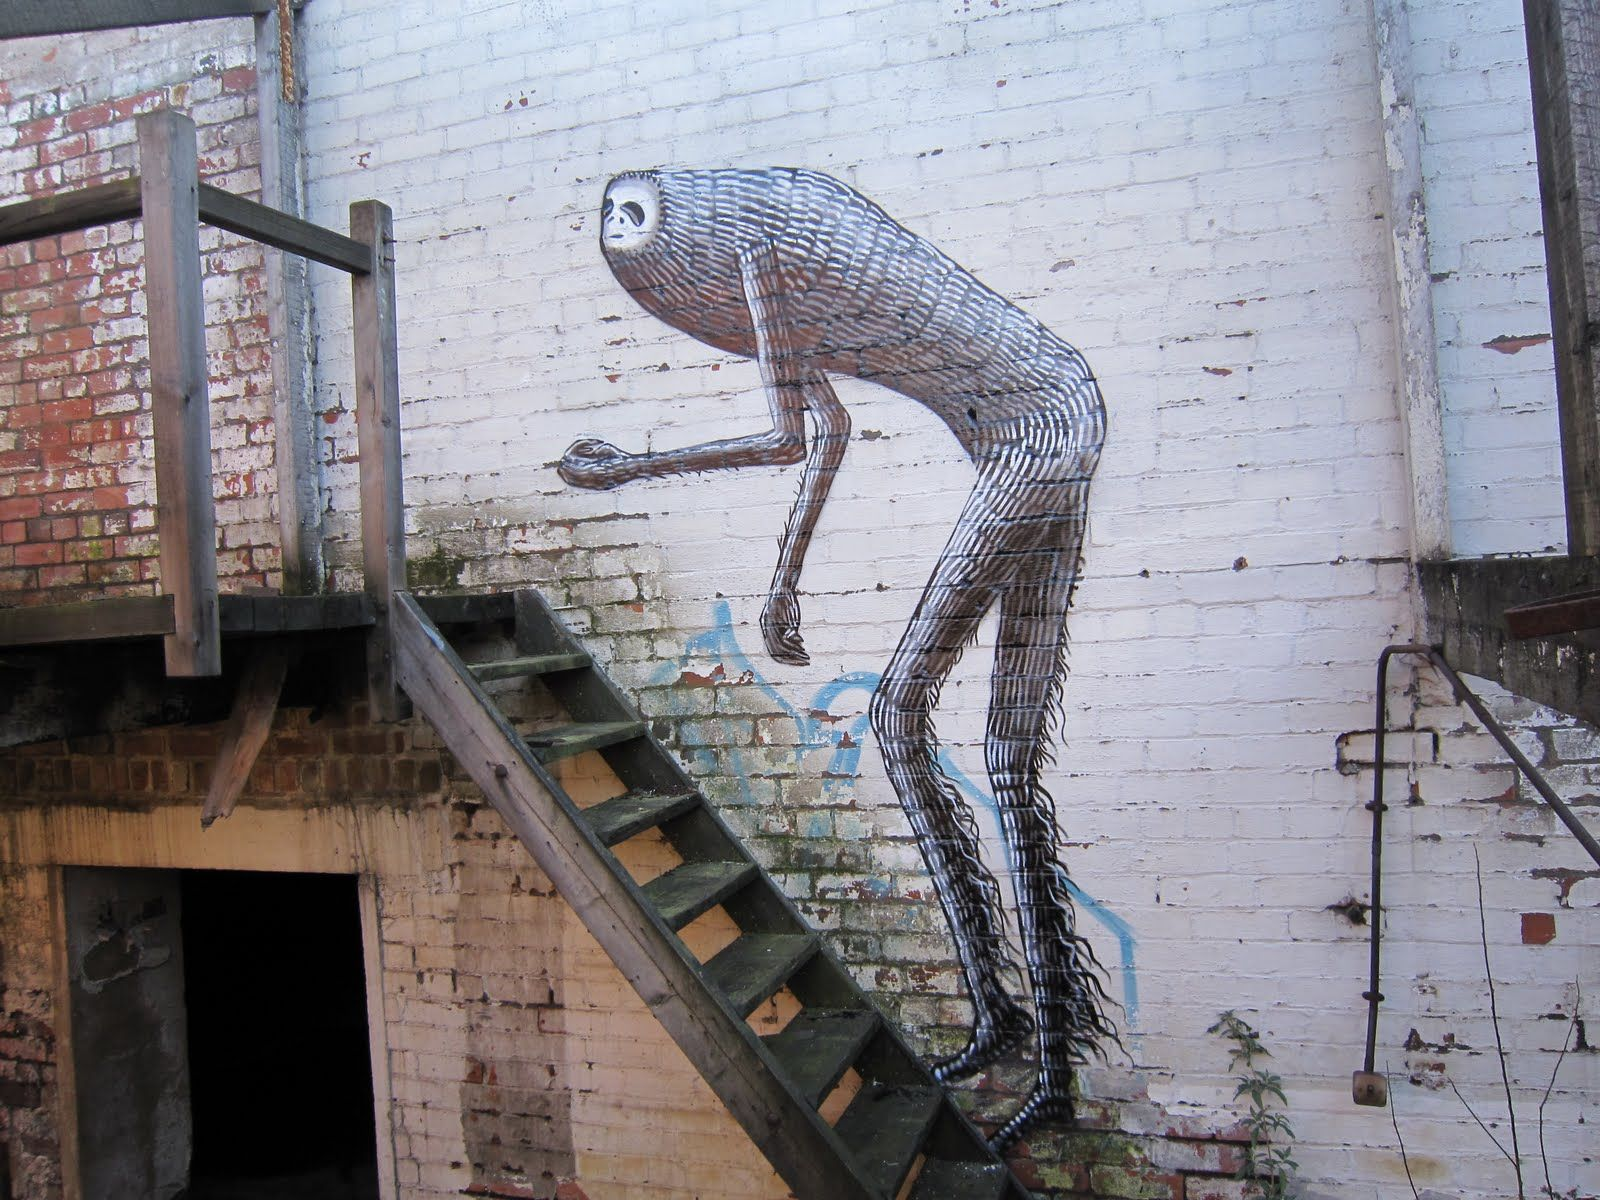 Phlegmjpg Visual Stimulation Pinterest Street - Awesome mechanical shark mural phlegm